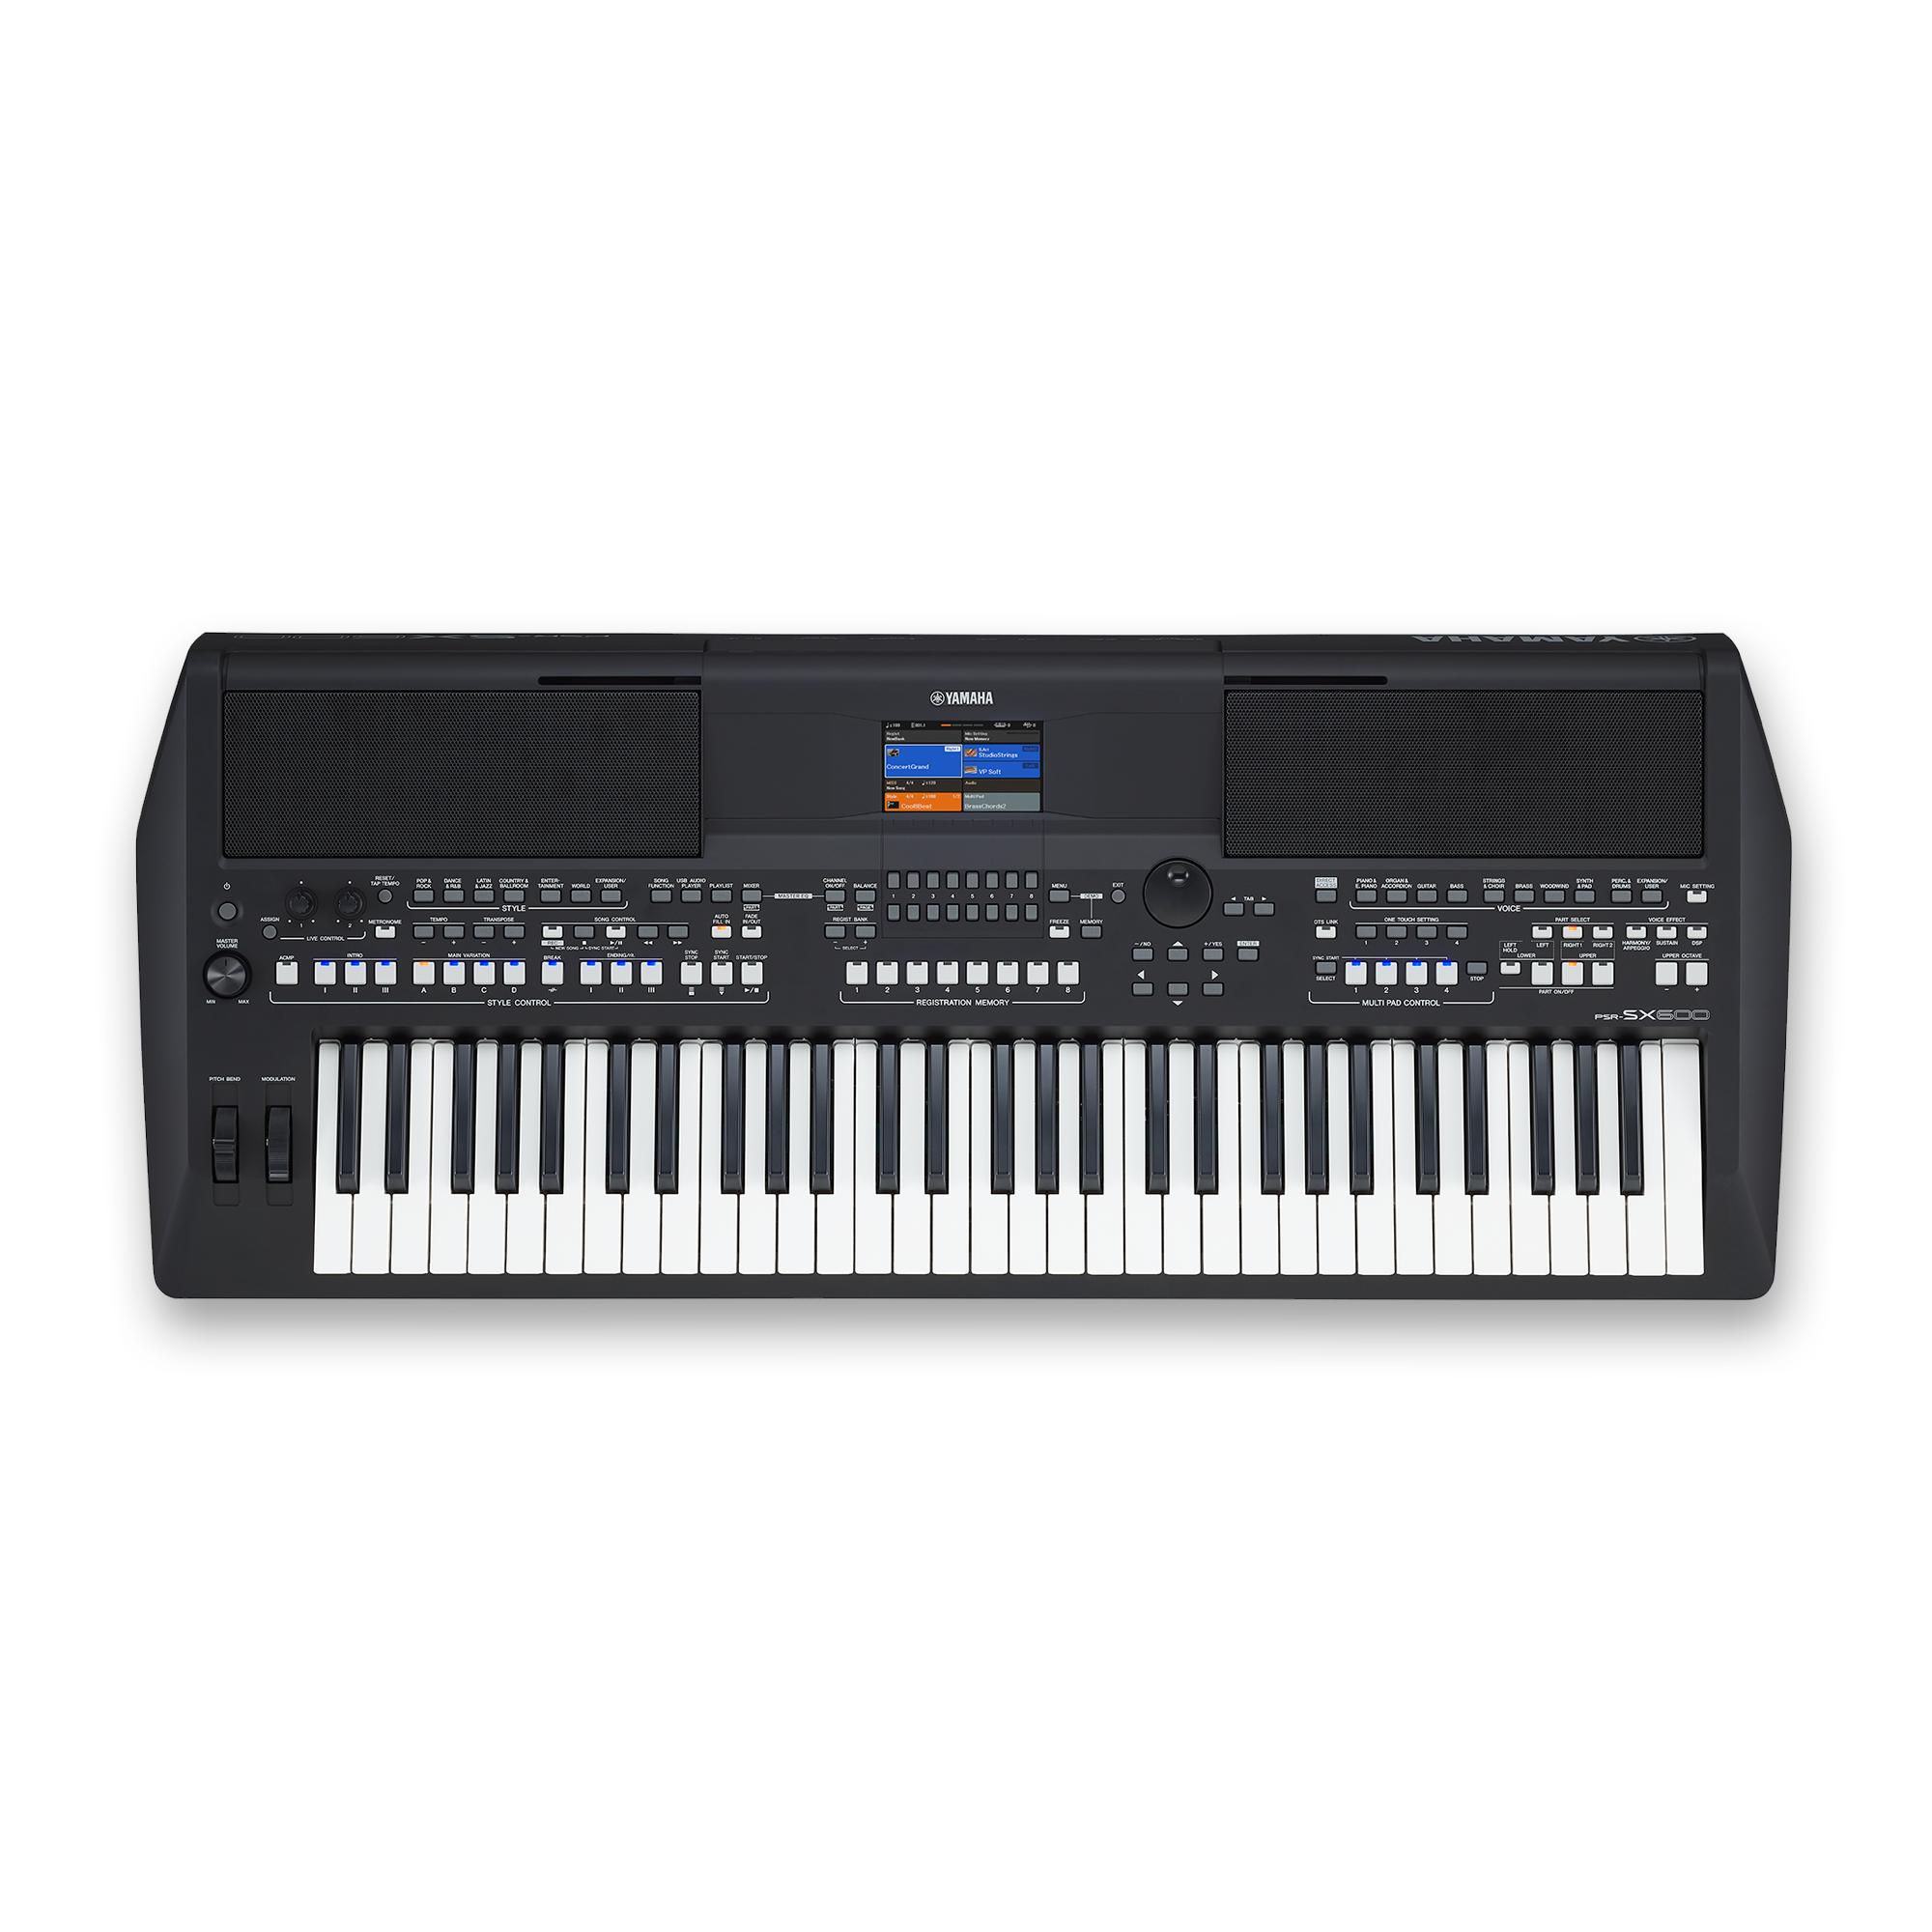 Yamaha PSR-SX600 61-key